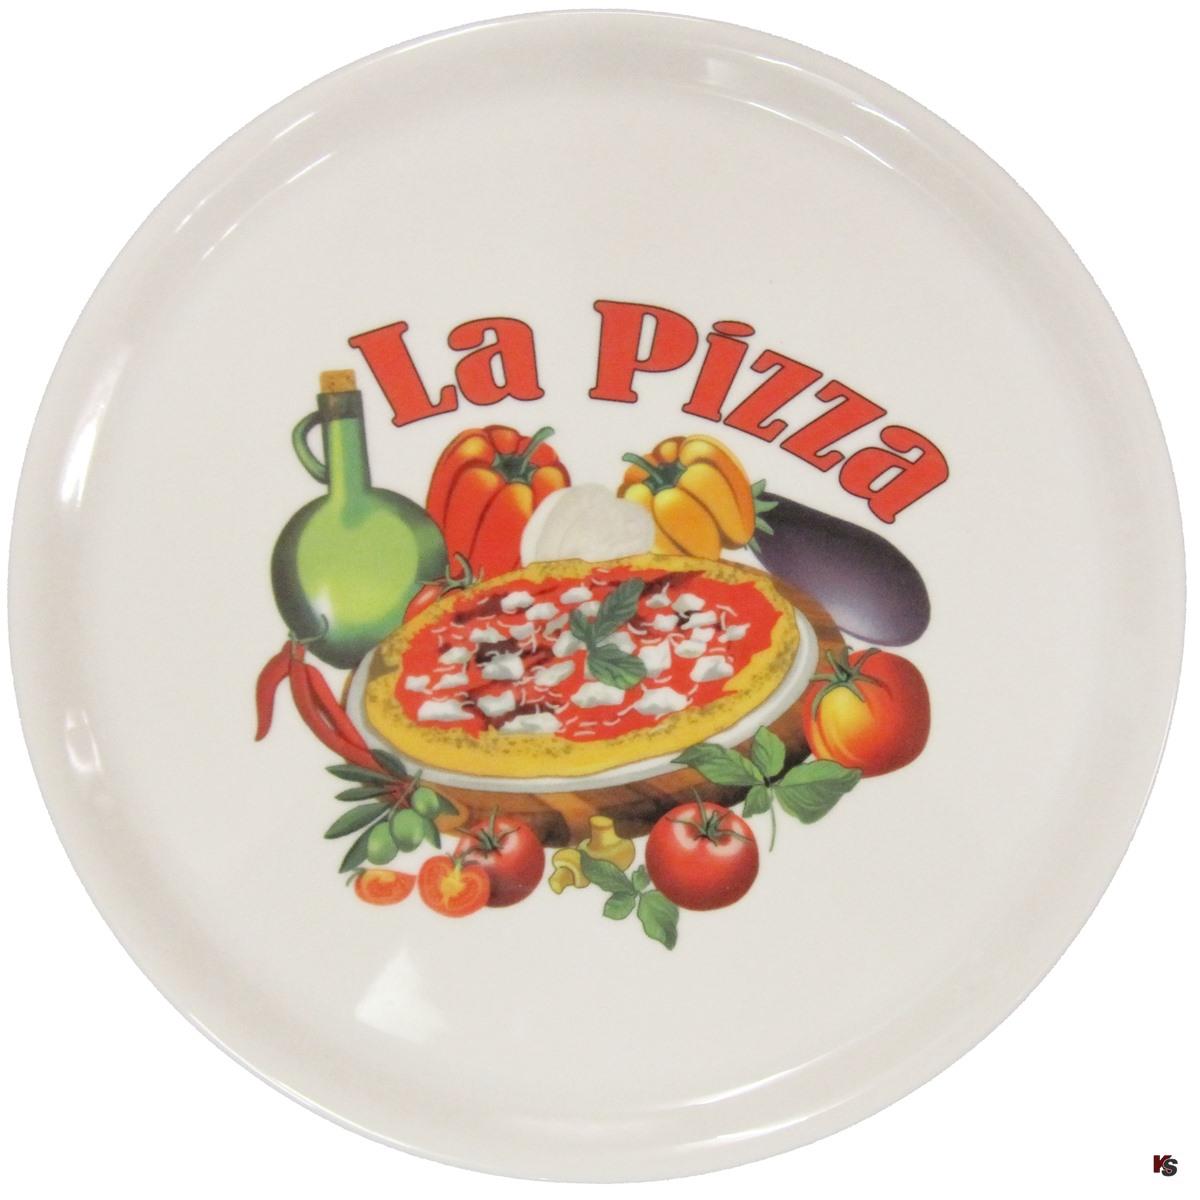 Pizza Teller 31cm, Porzellan Pizzateller mit Motiv La Pizza, Pizzateller -La Pizza- von Saturnia,31cm